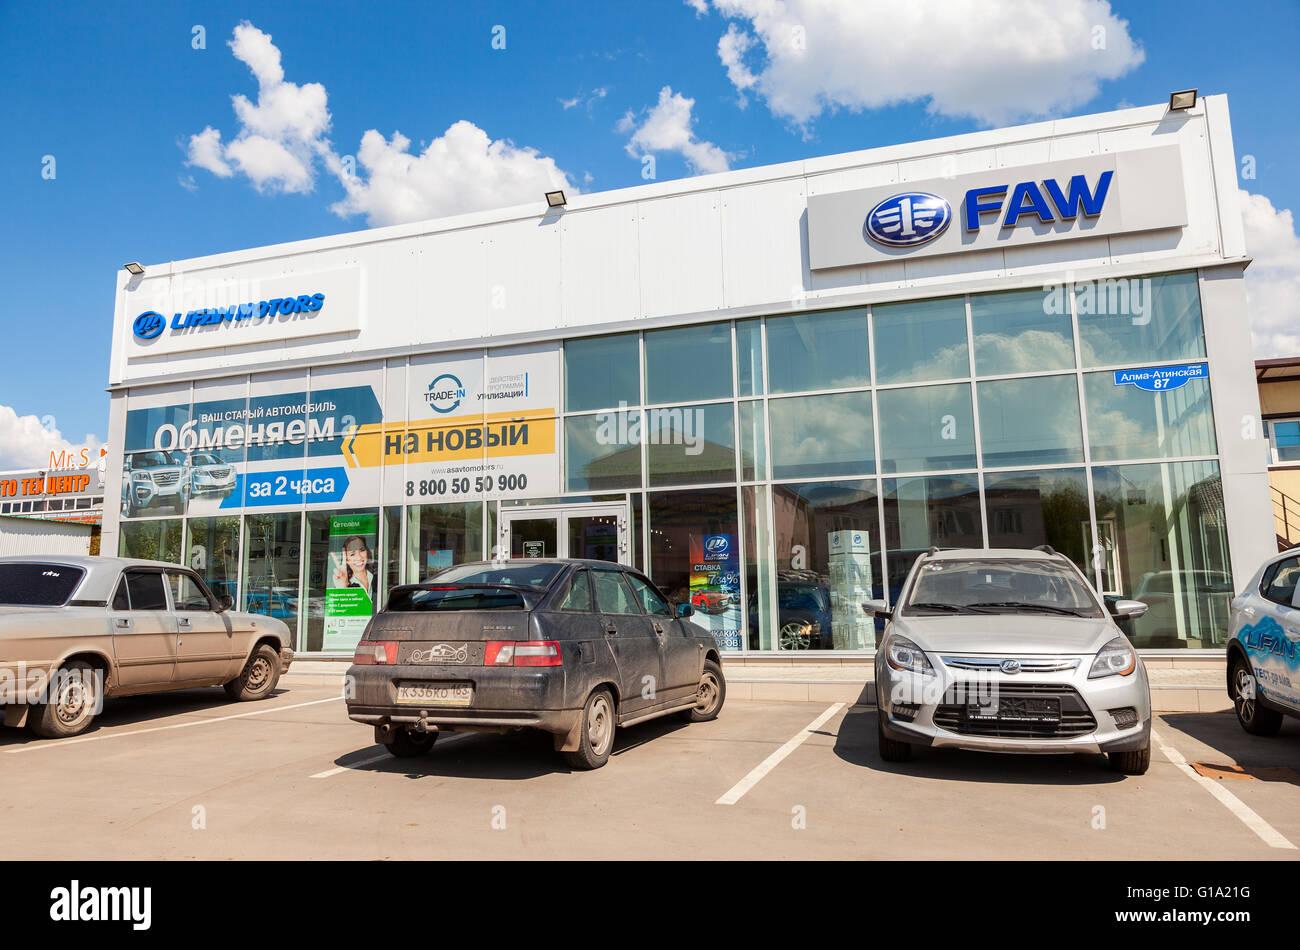 Office of official dealer Lifan Motors. - Stock Image